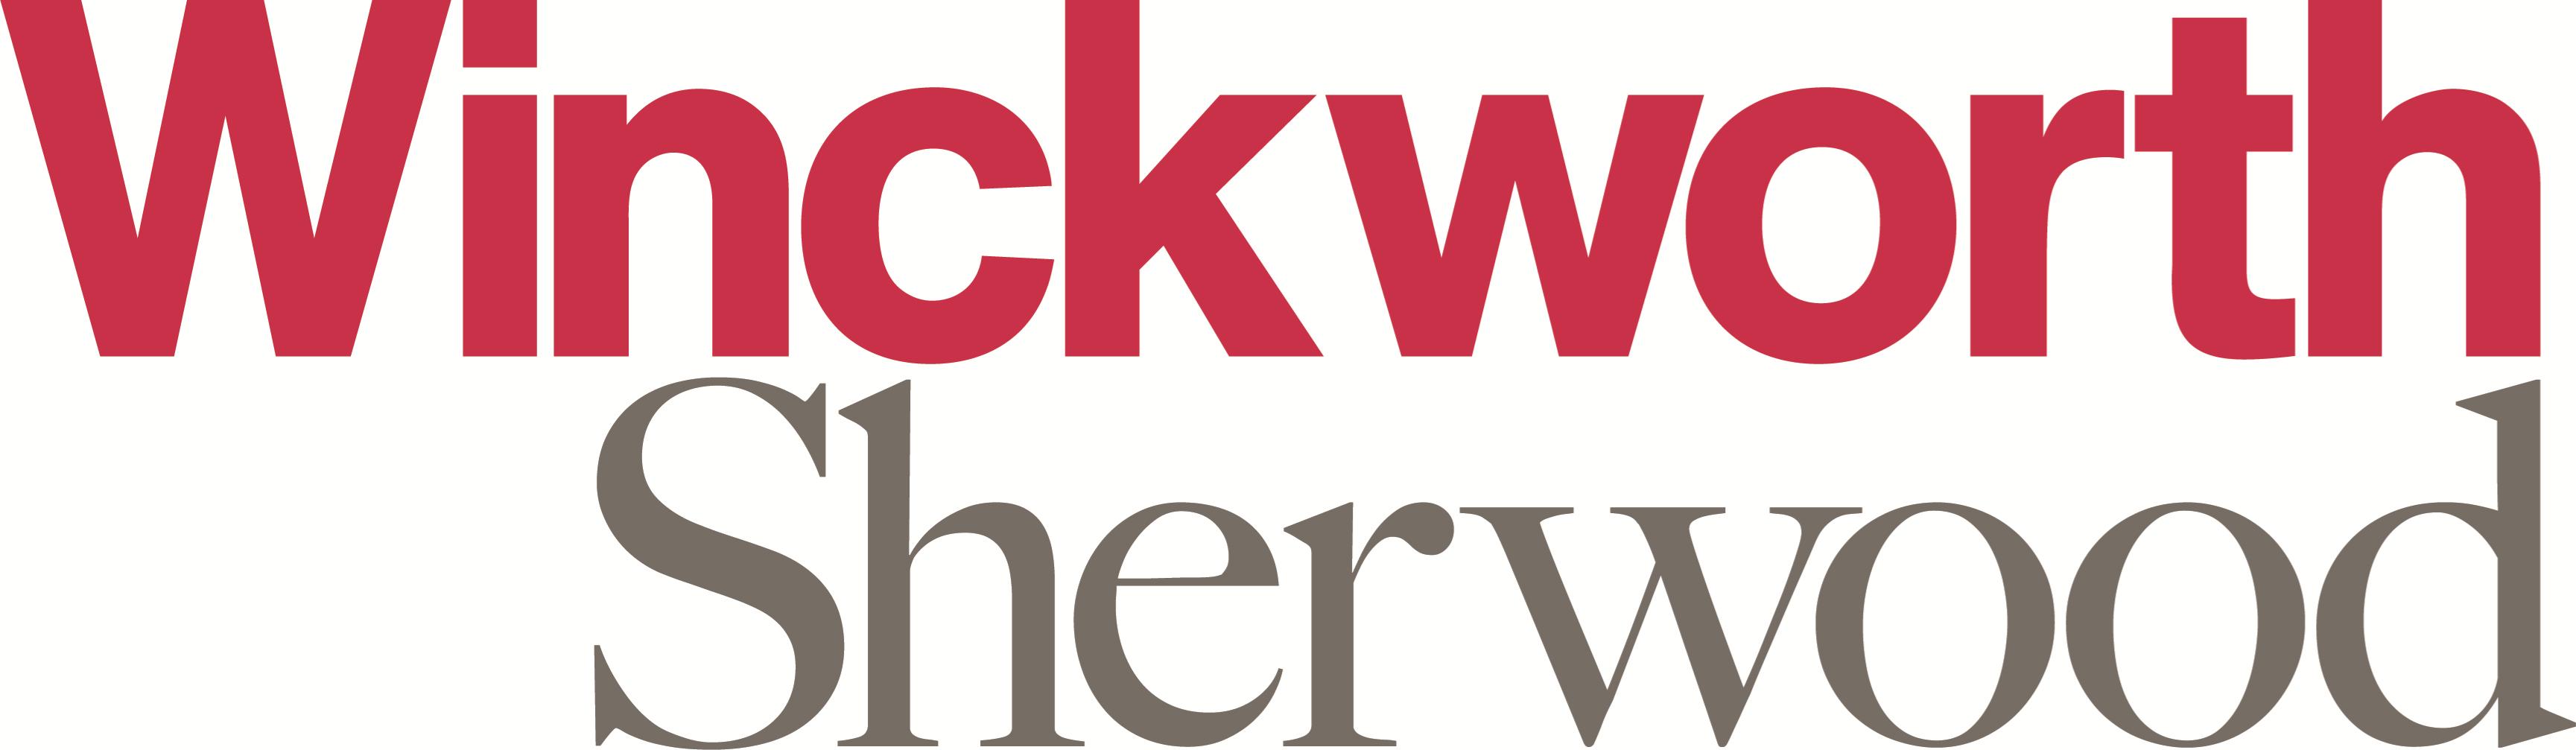 Winckworth Sherwood LLP